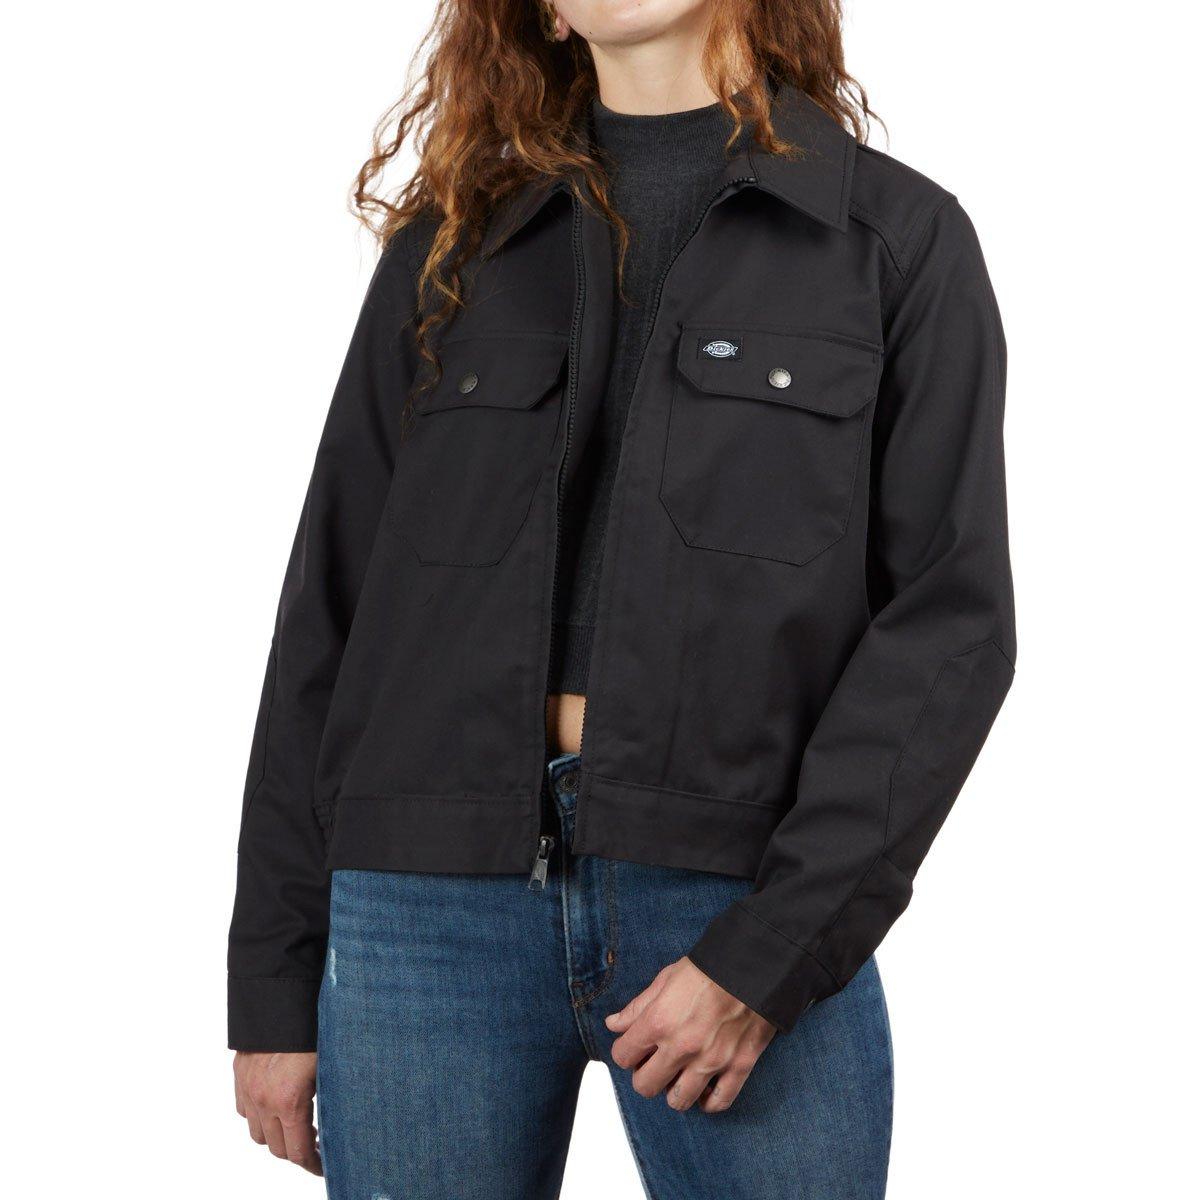 Military Jacke Damen kurz schwarz